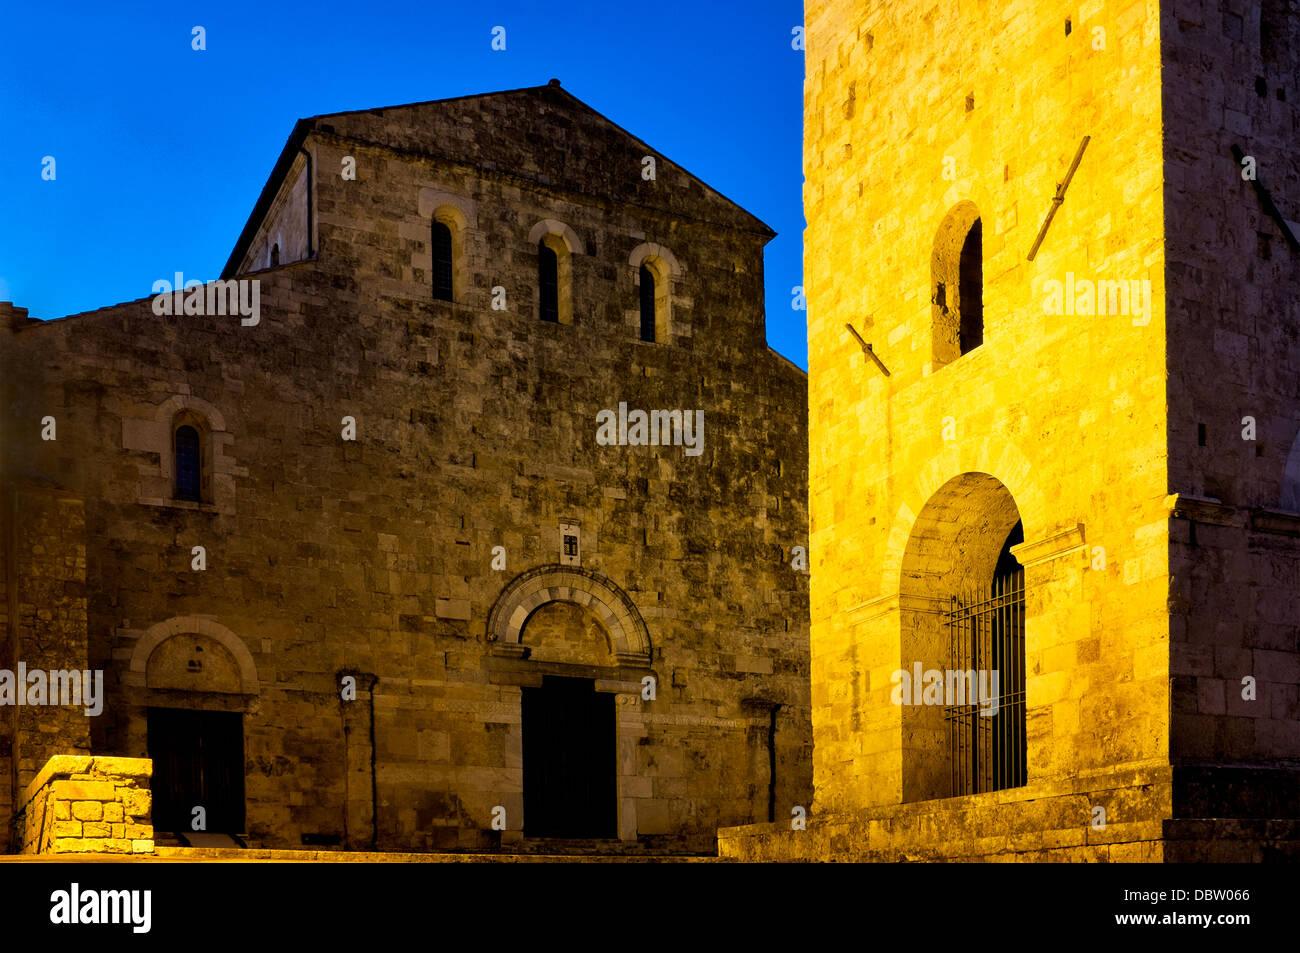 Façade de la cathédrale de Santa Maria, Anagni, Italie Photo Stock